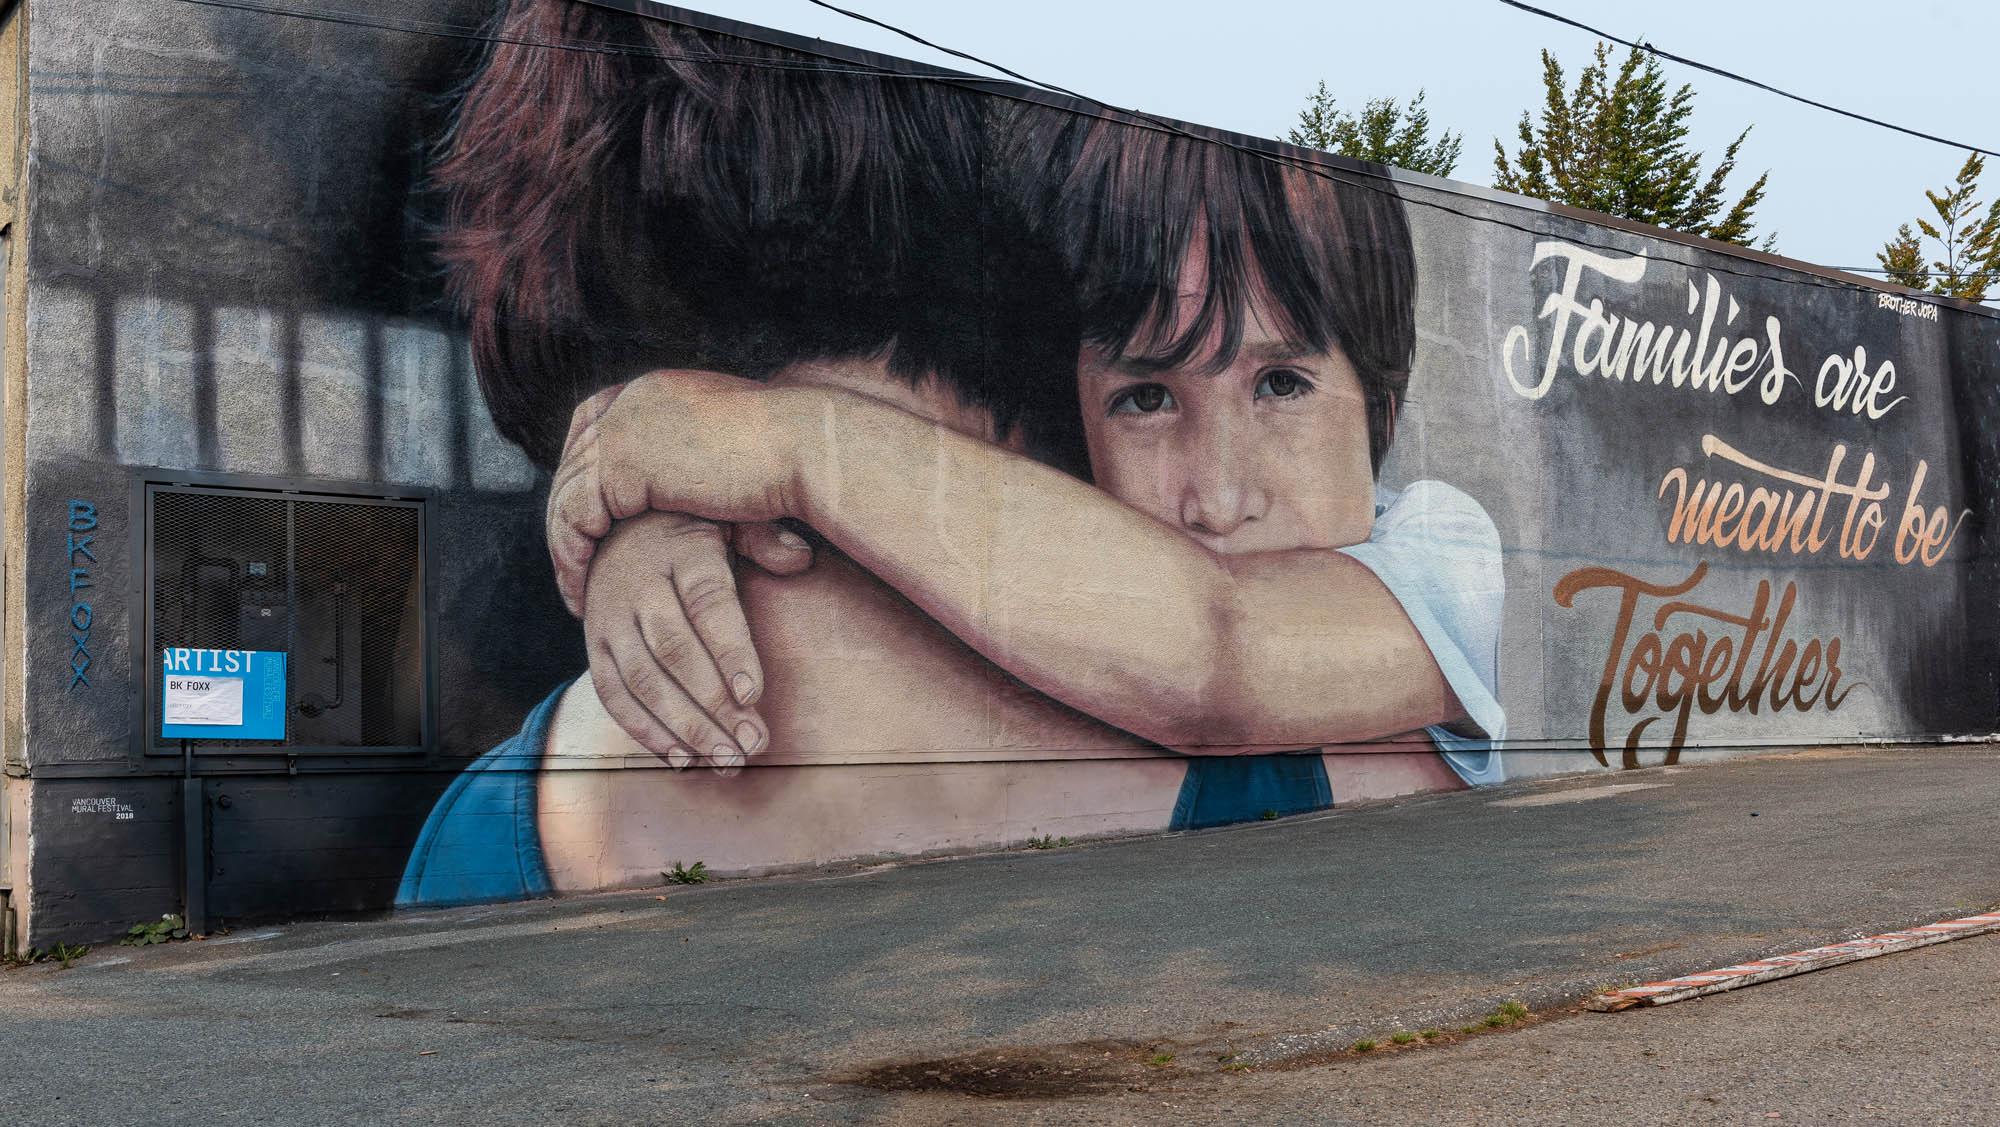 GabrielMartins_VMF_Murals2018_20180813_008.jpg